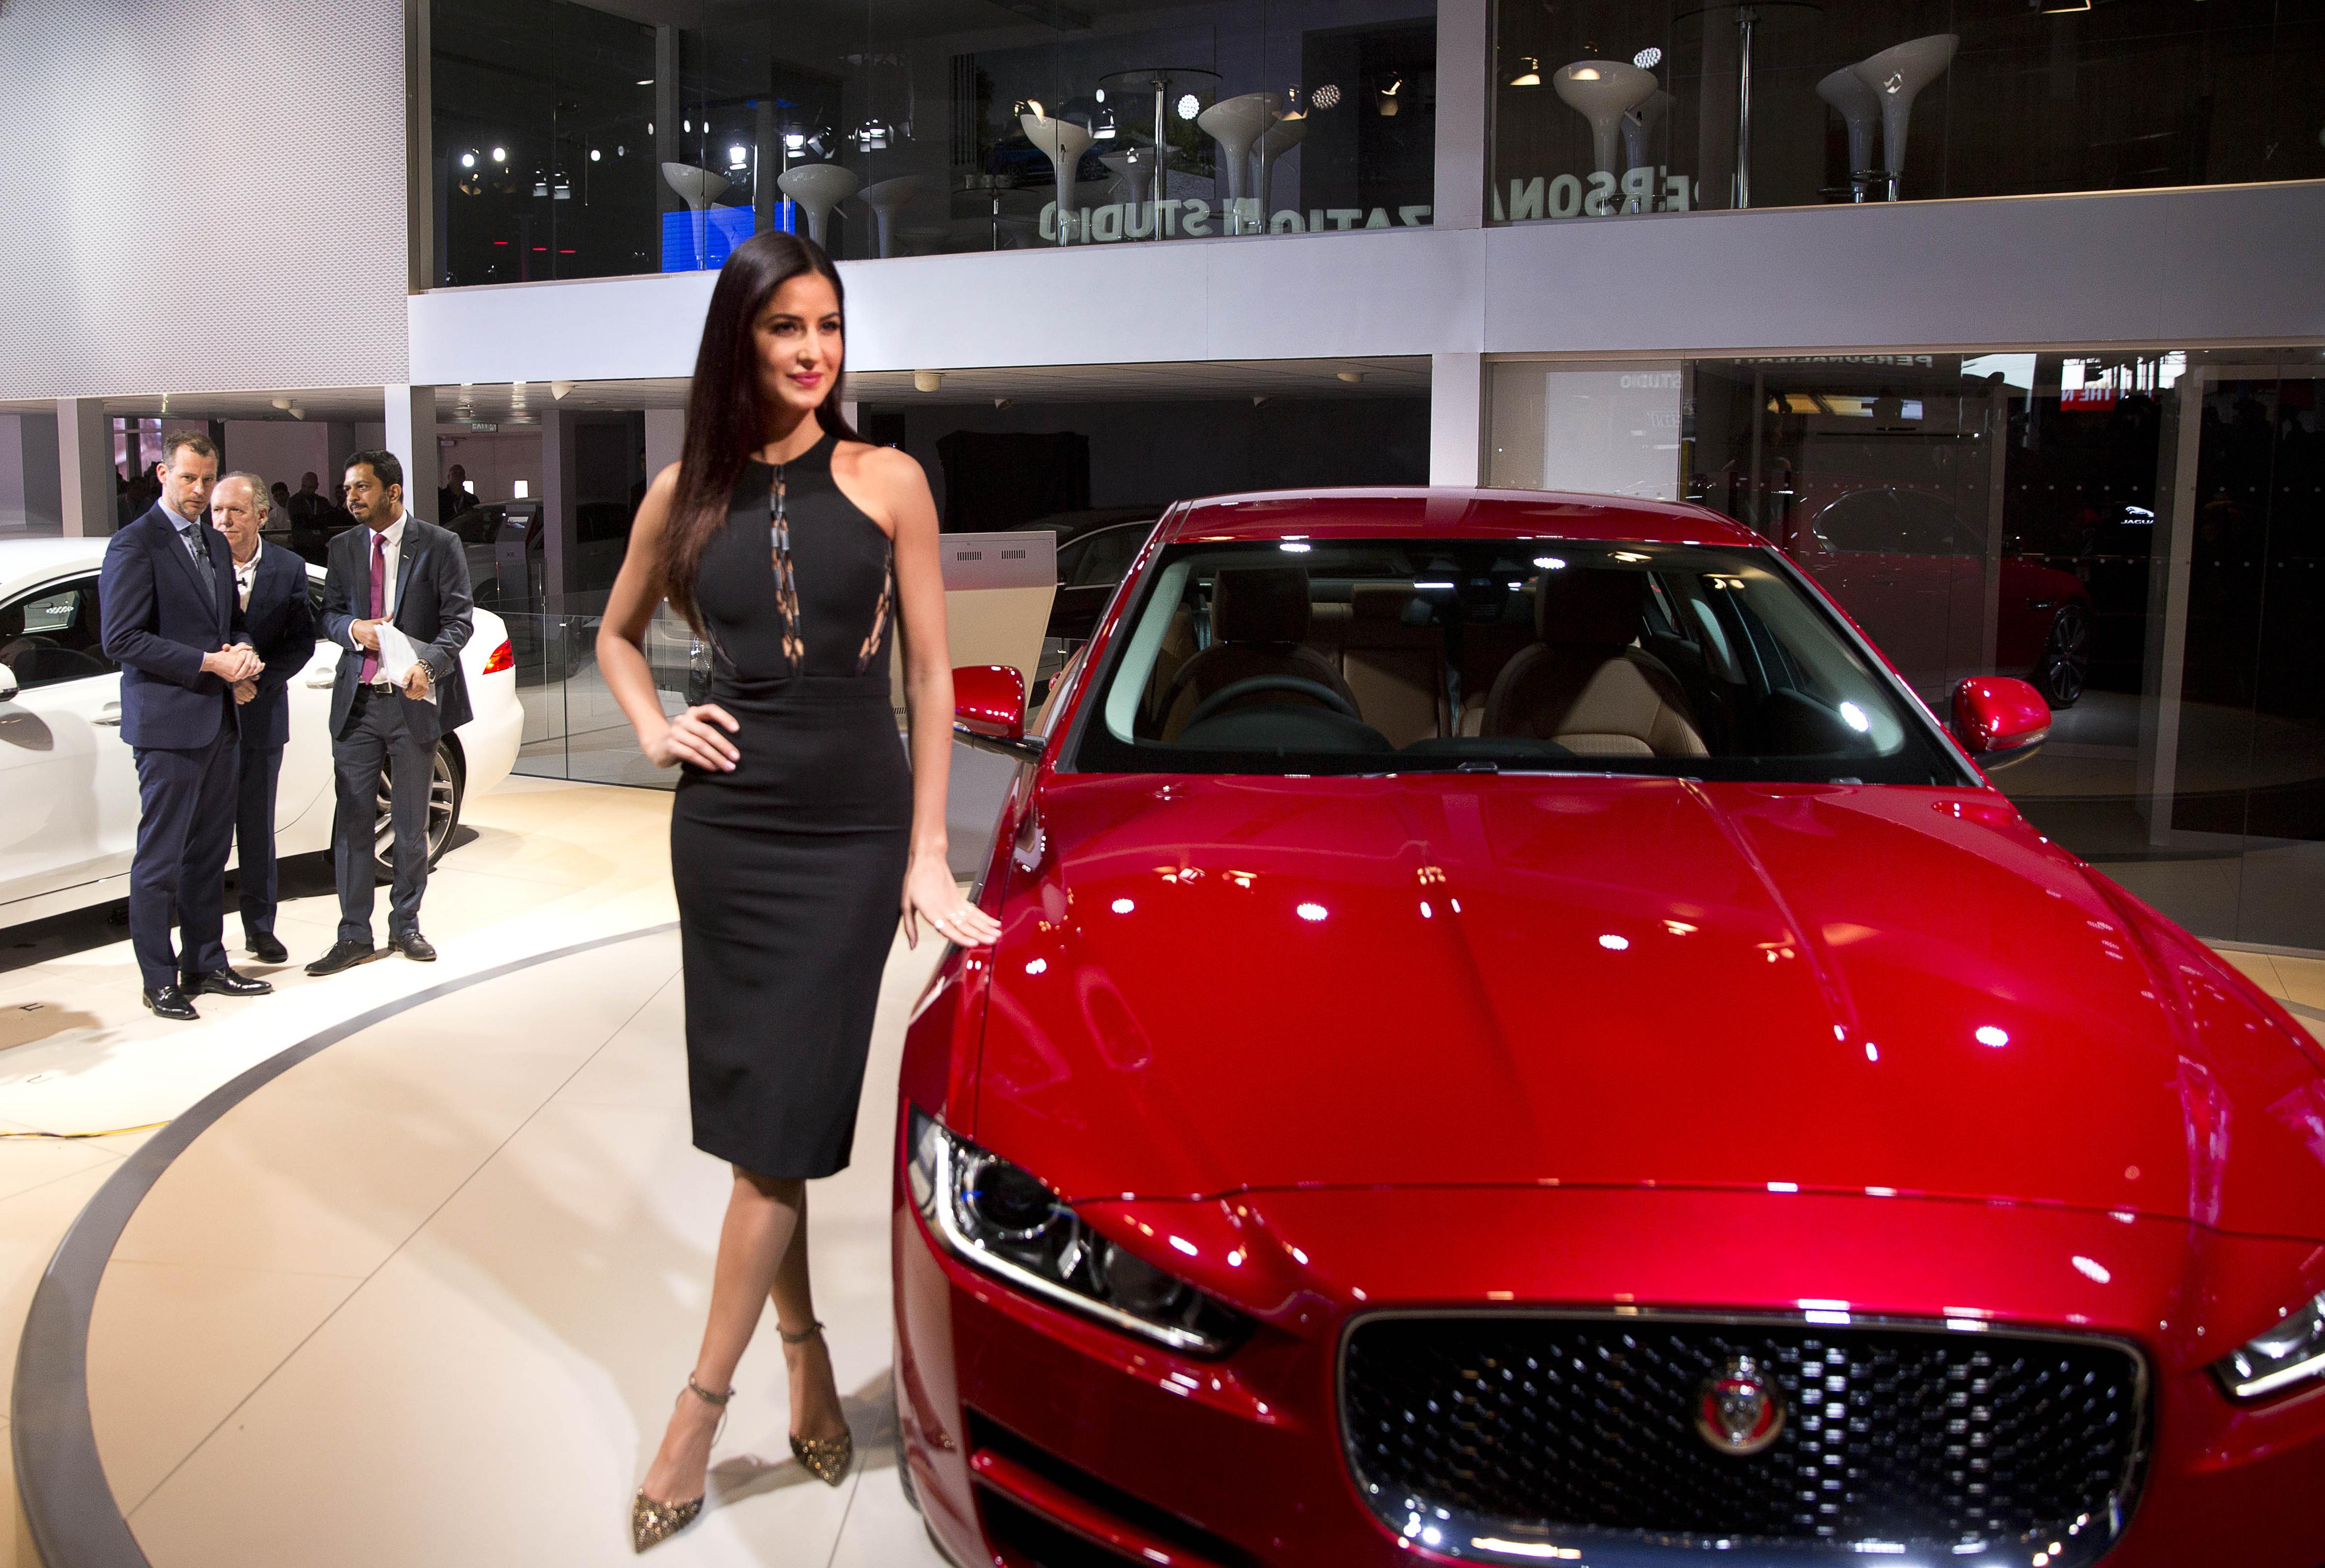 Celebrities At 2016 Auto Expo Sachin Tendulkar Ranbir: India's Biggest Auto Expo Has Too Many Models, Without